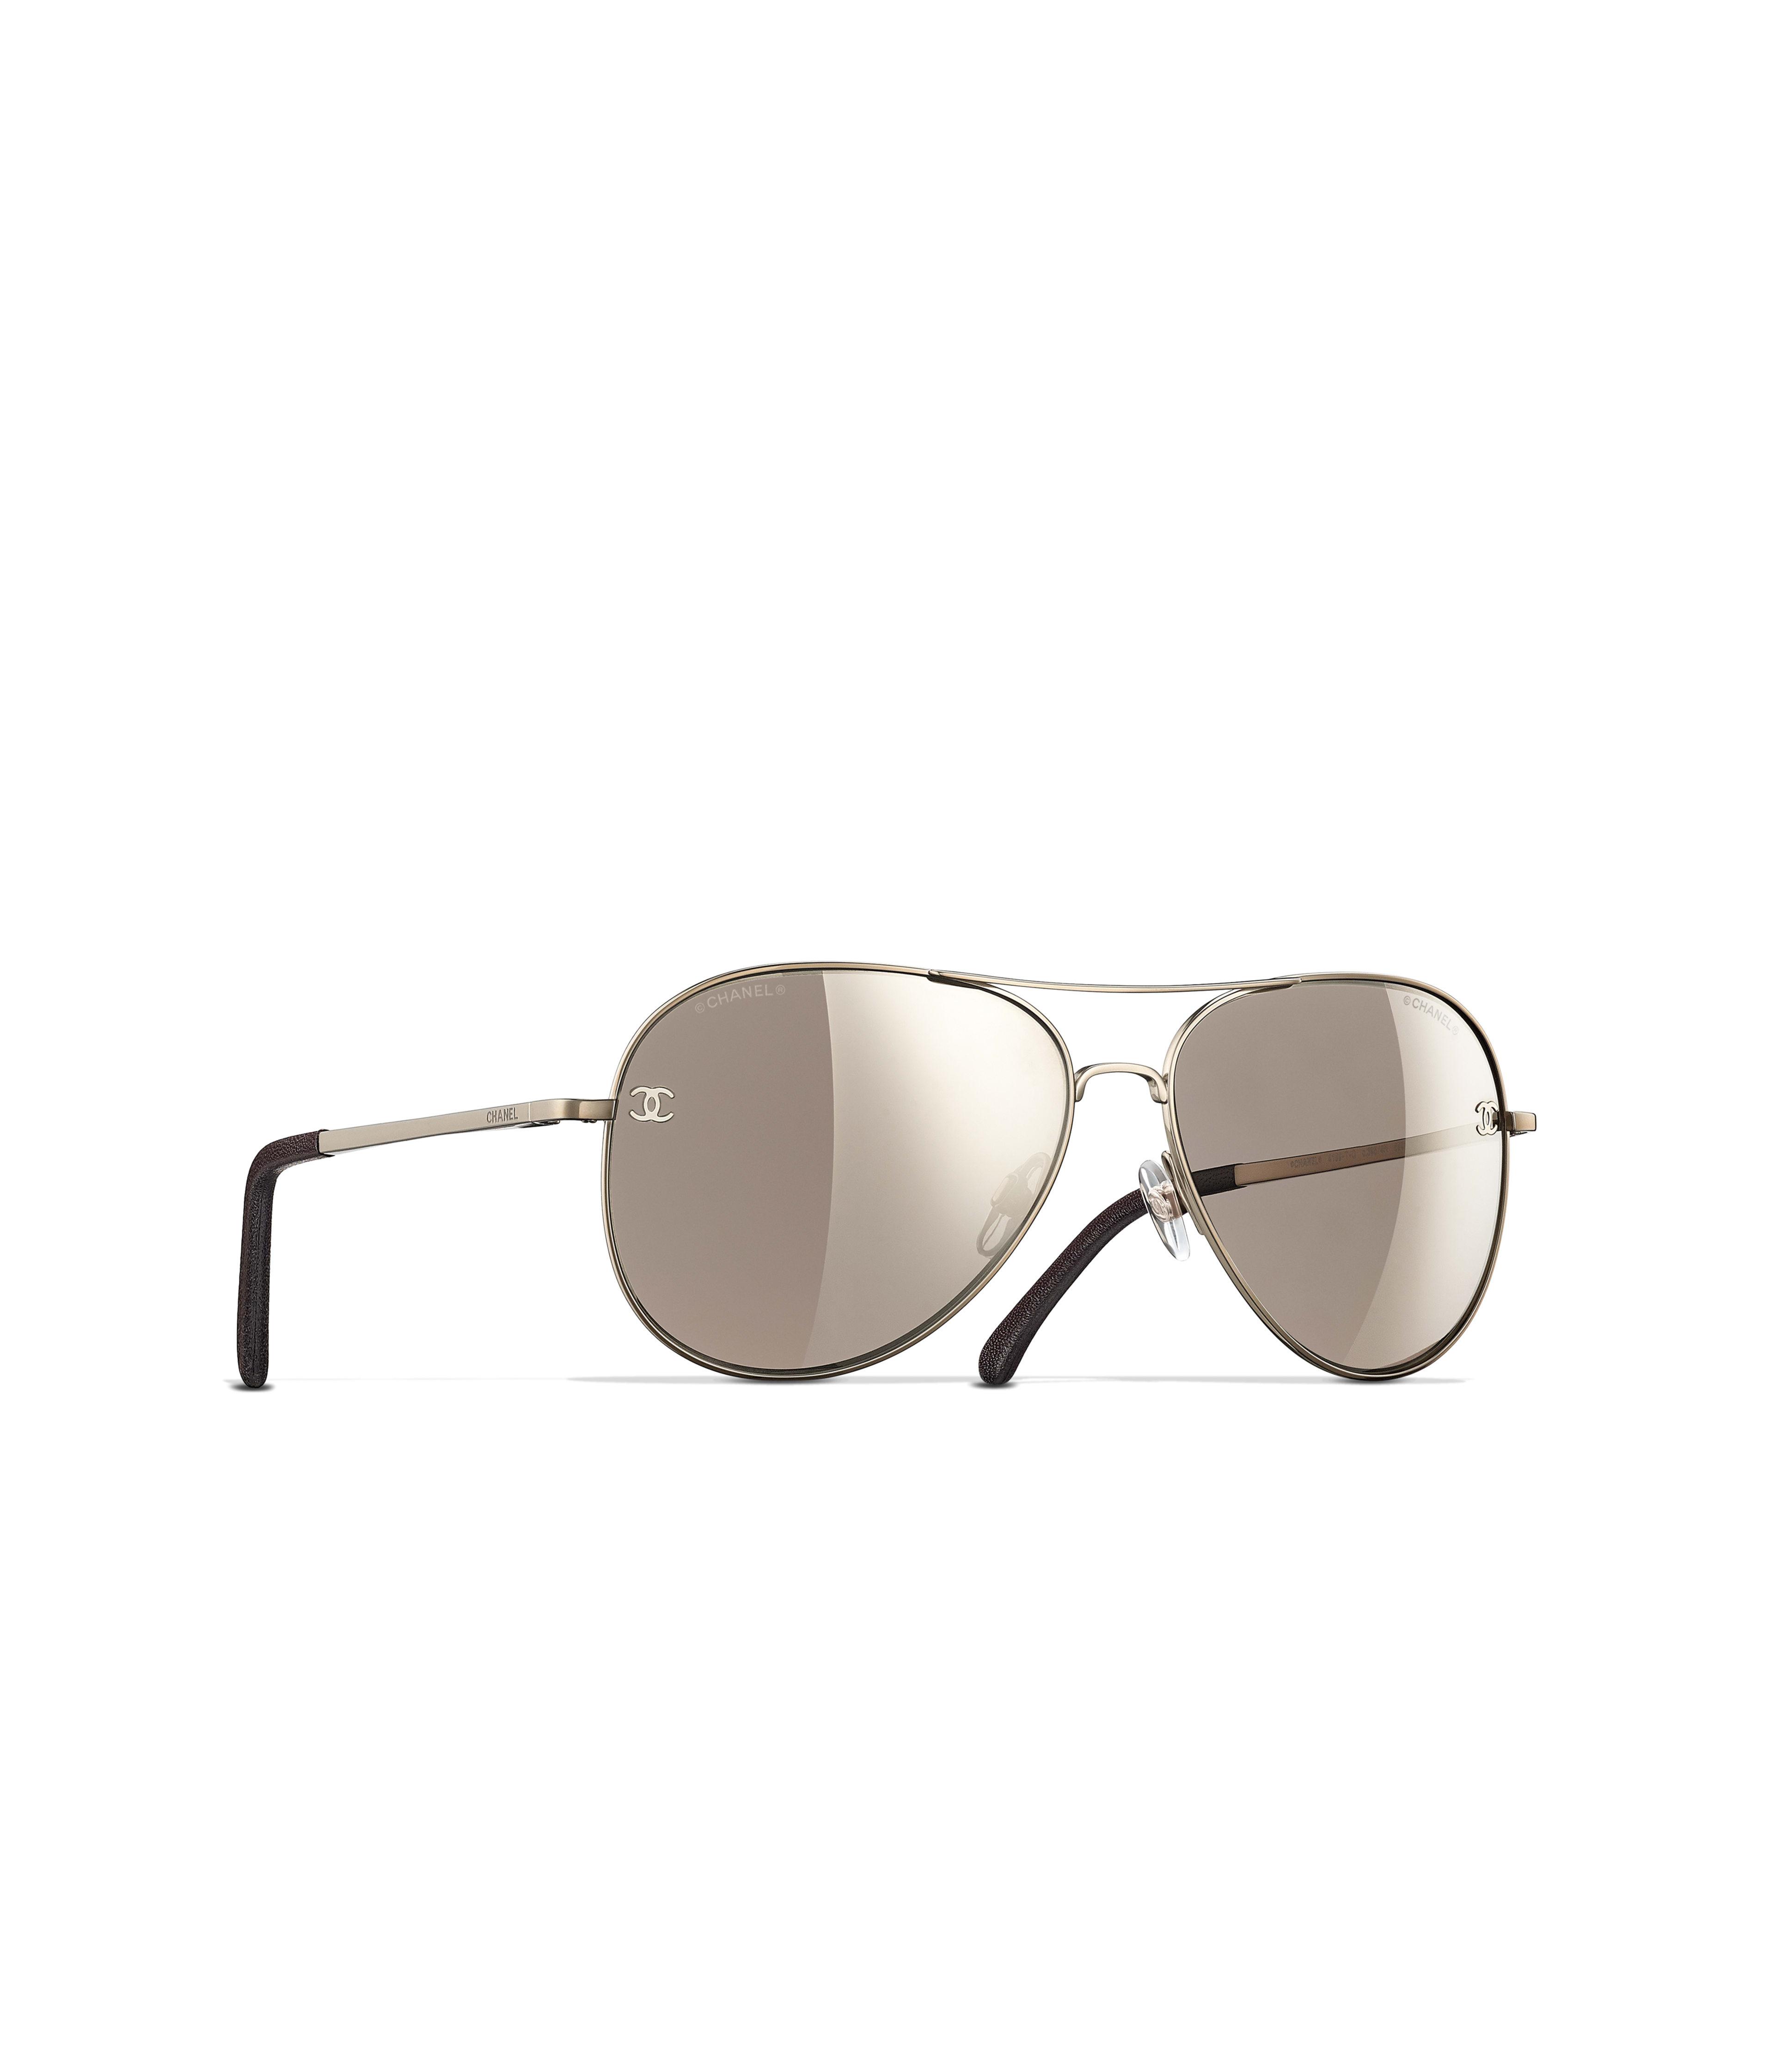 8717a77271c Pilot Sunglasses Ref. 4189TQ C395 6G